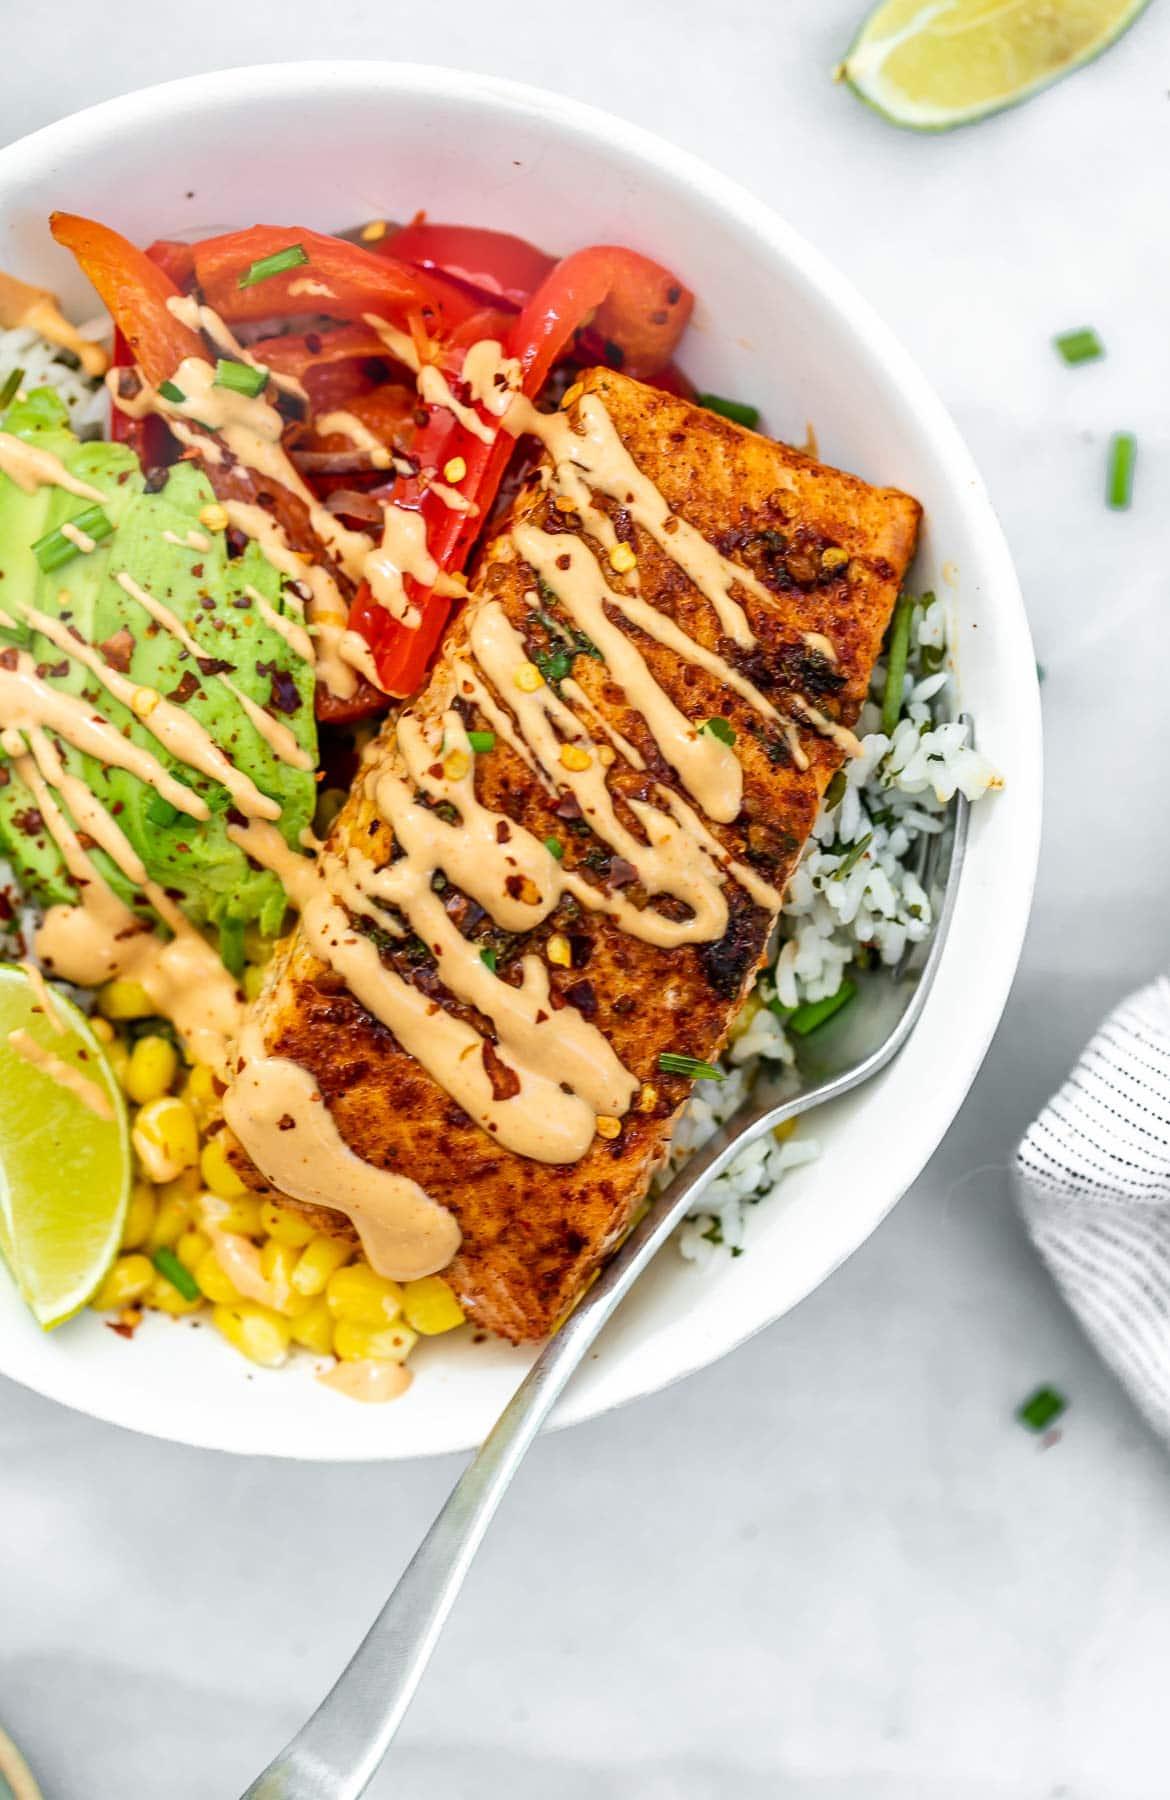 Chili lime salmon bowls with tahini dressing on top.